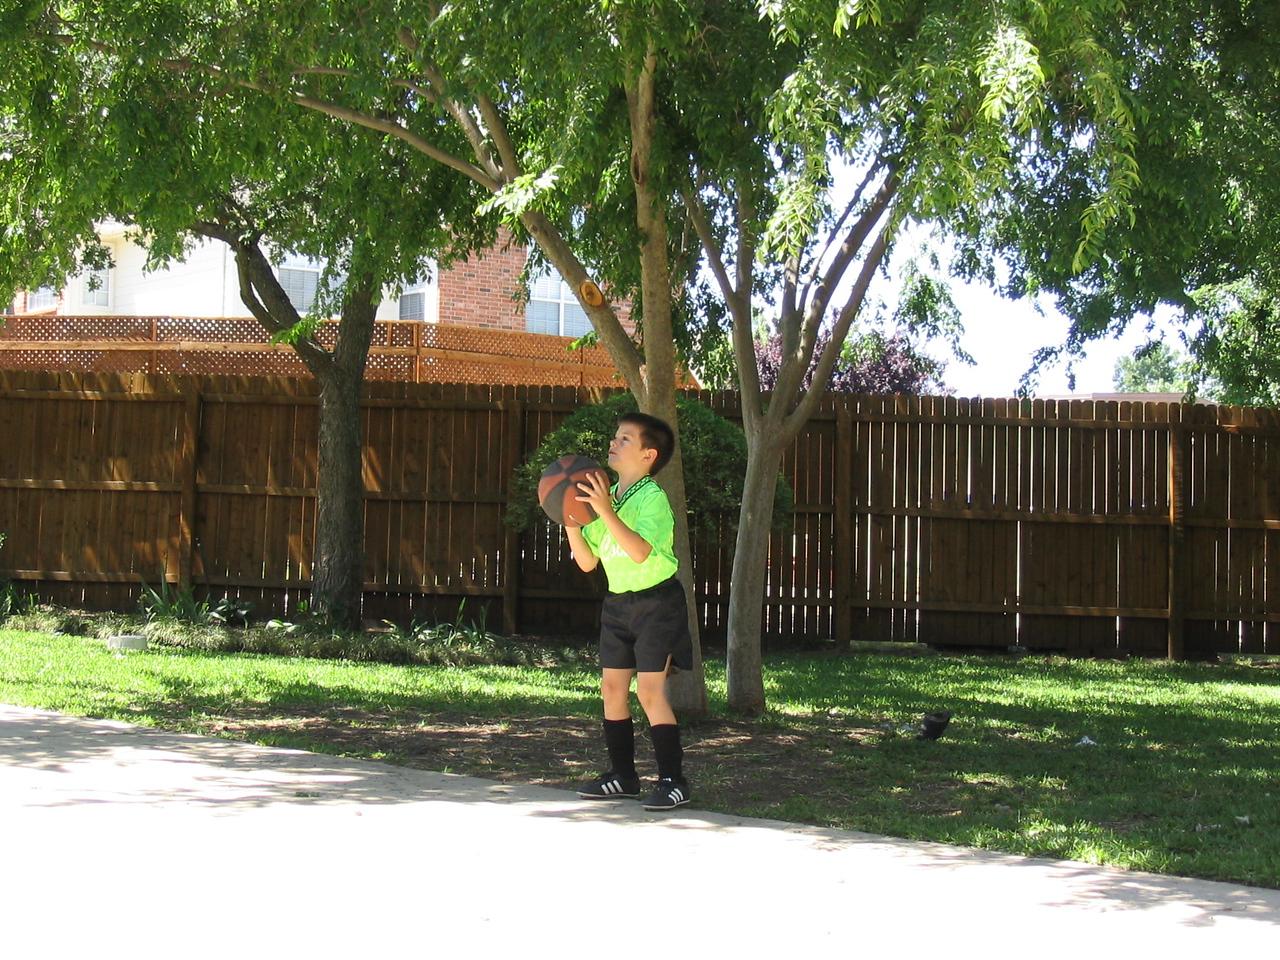 Reid shooting hoops before his soccer game...makes perfect sense.